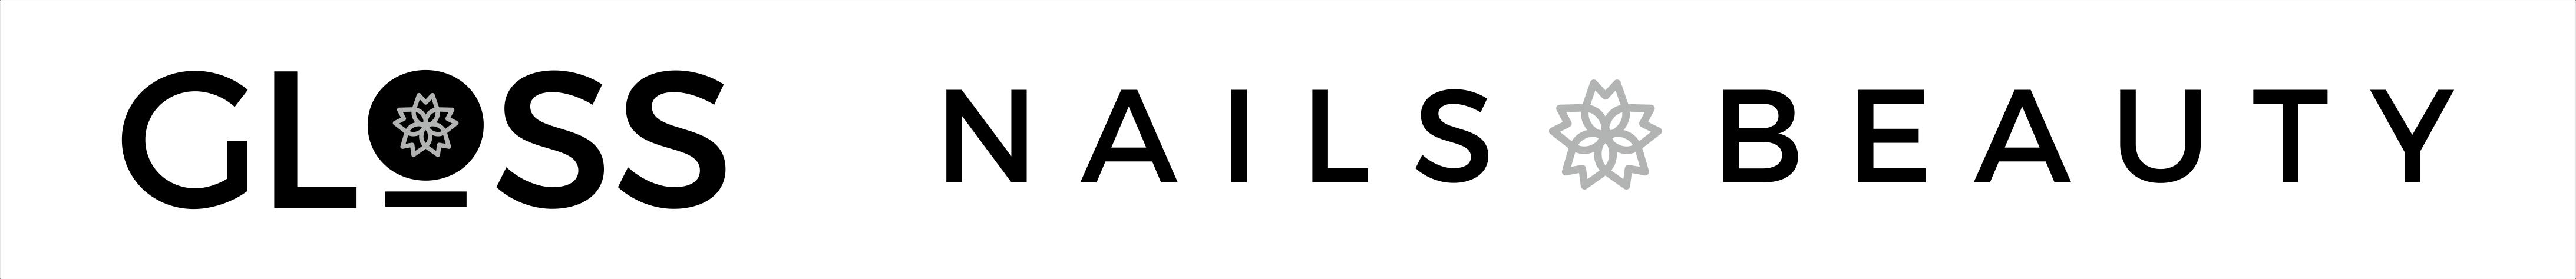 Gloss Nails & Beauty